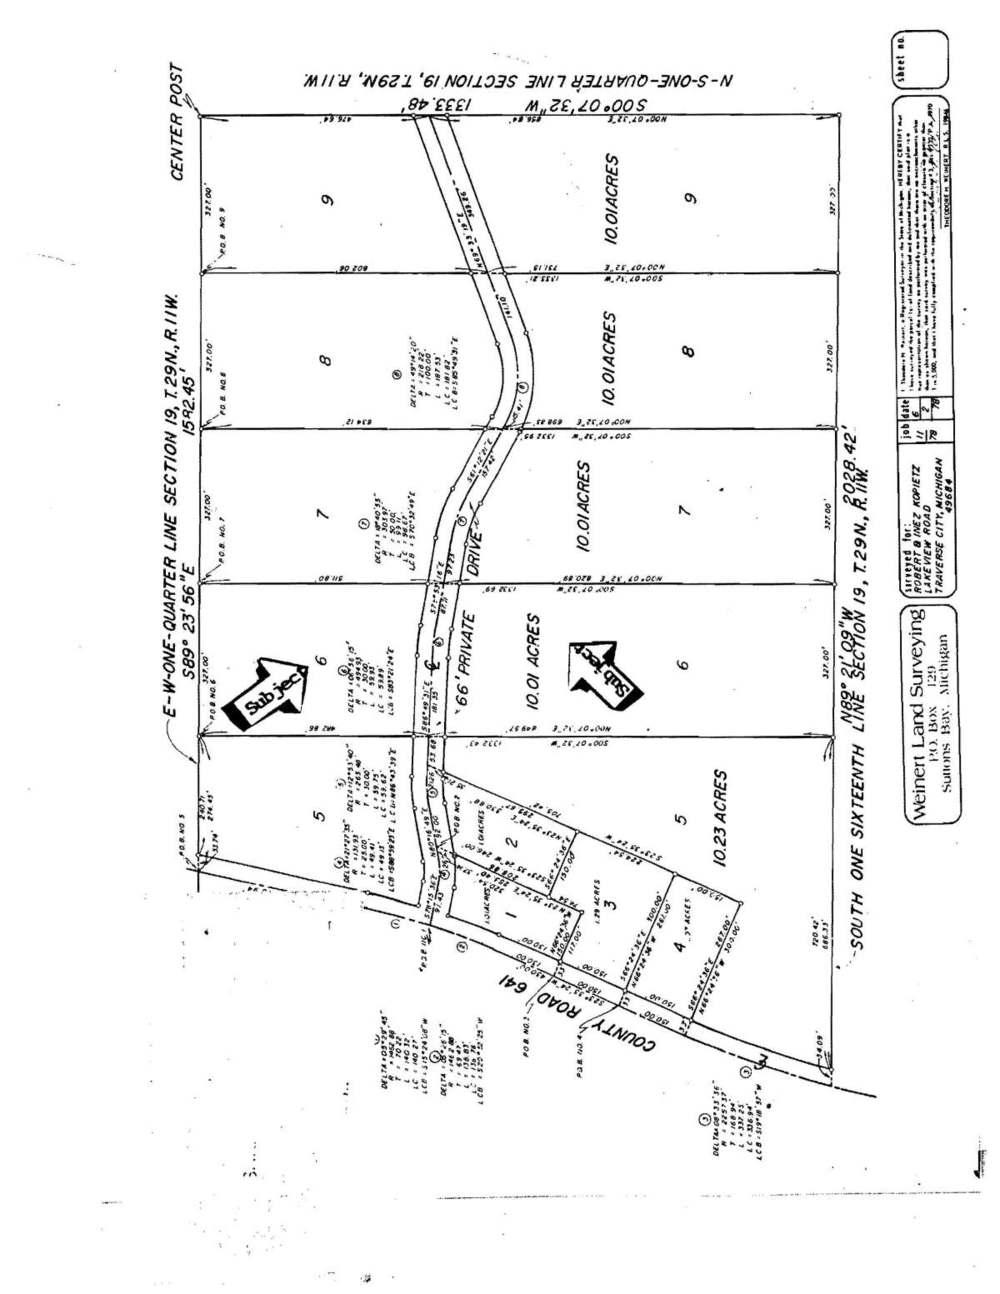 e nicholas drive, traverse city, leelanau county, acreage for sale by oltersdorf realty llc (8).jpg